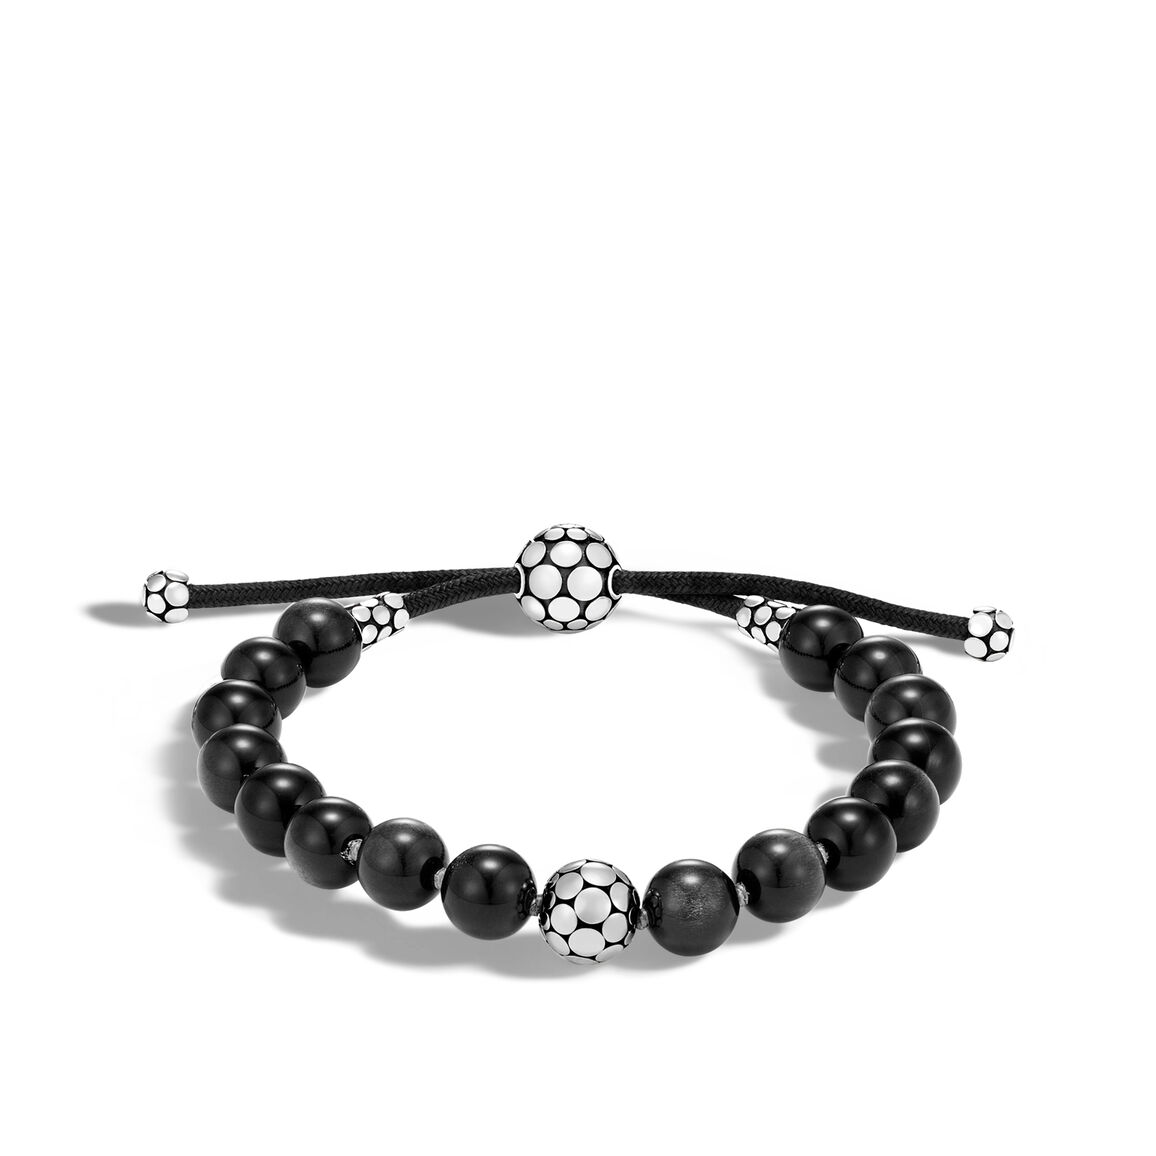 Dot Bead Bracelet in Silver with 8MM Gemstone